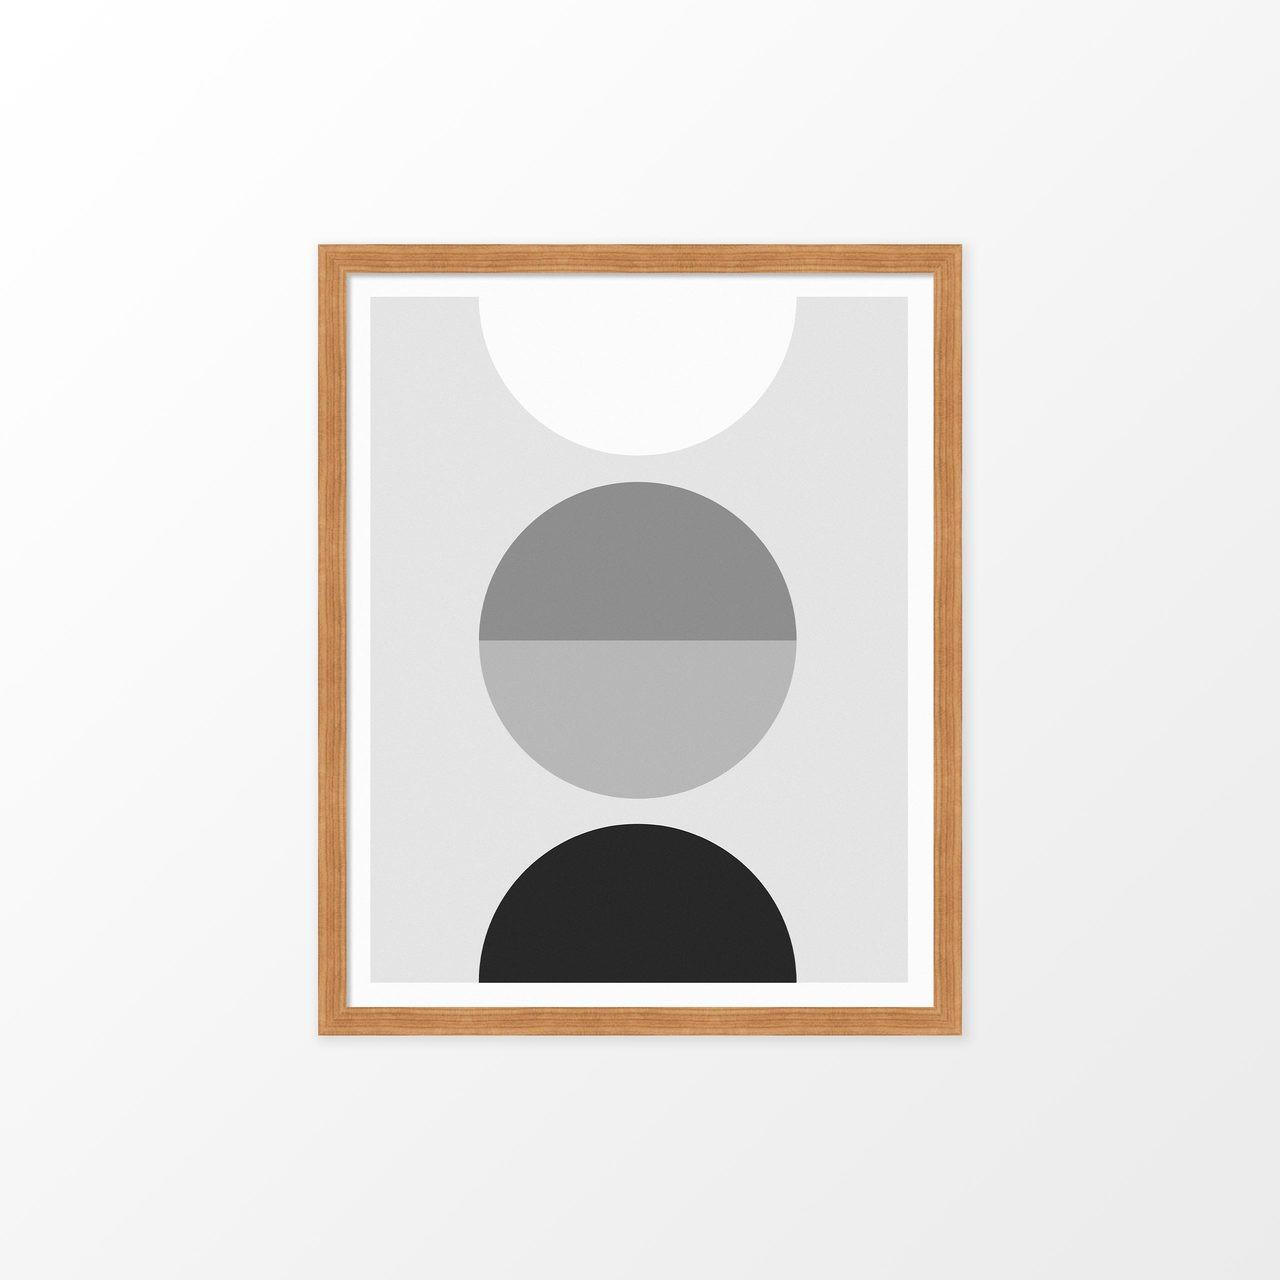 'Luna' Black and White Geometric Digital Art Print from The Printed Home